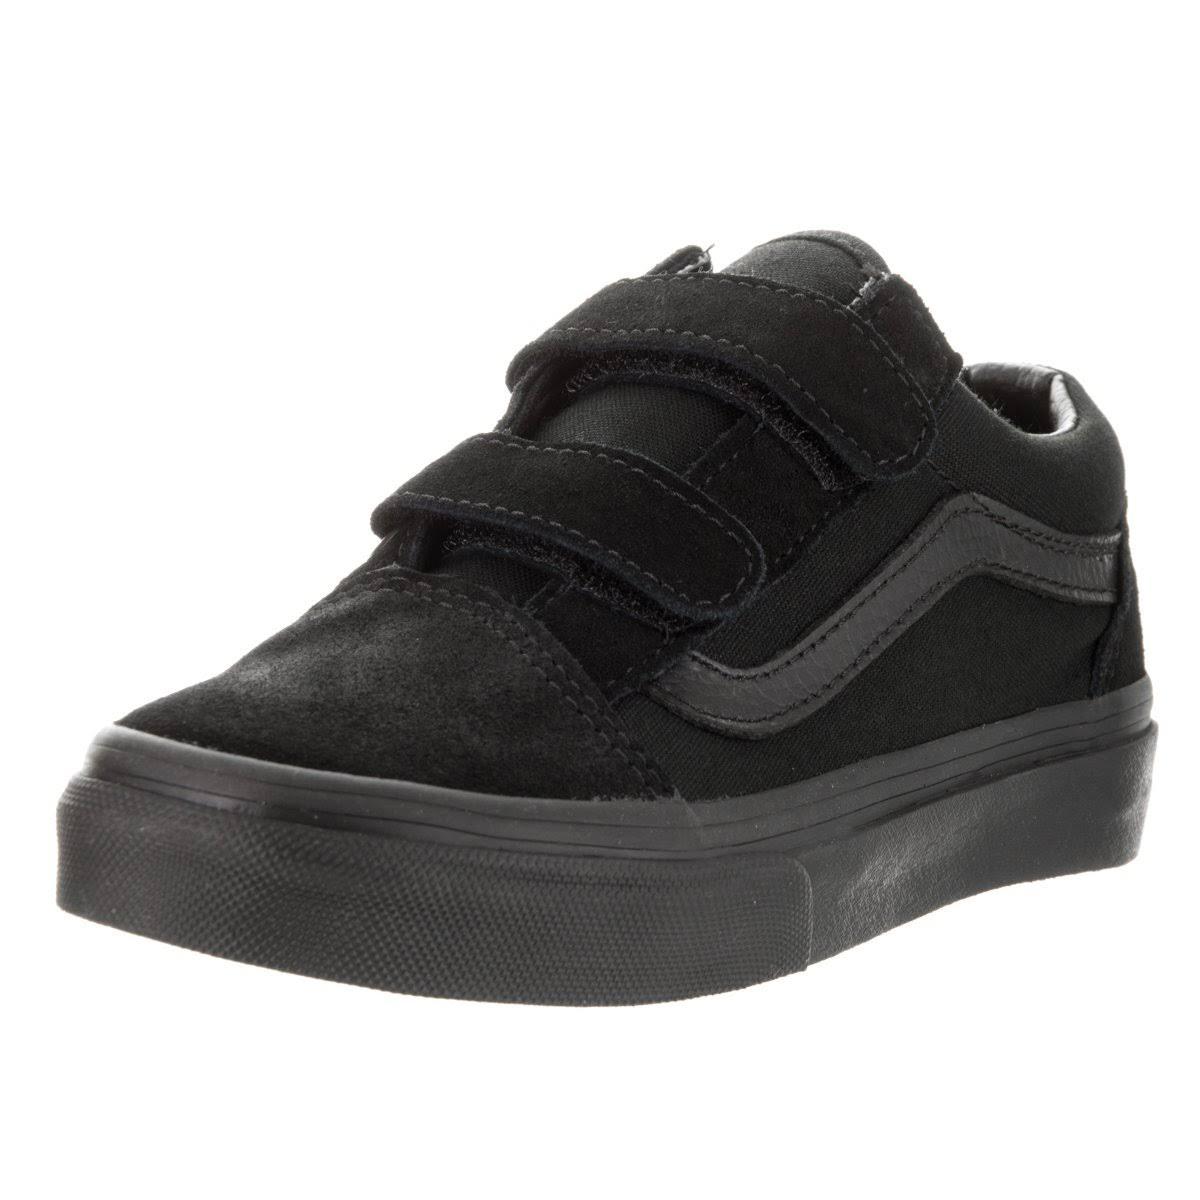 Vans Skate V 1 Kids Pk Zapatillas Old De School Blk 5 qHxwx5EYT